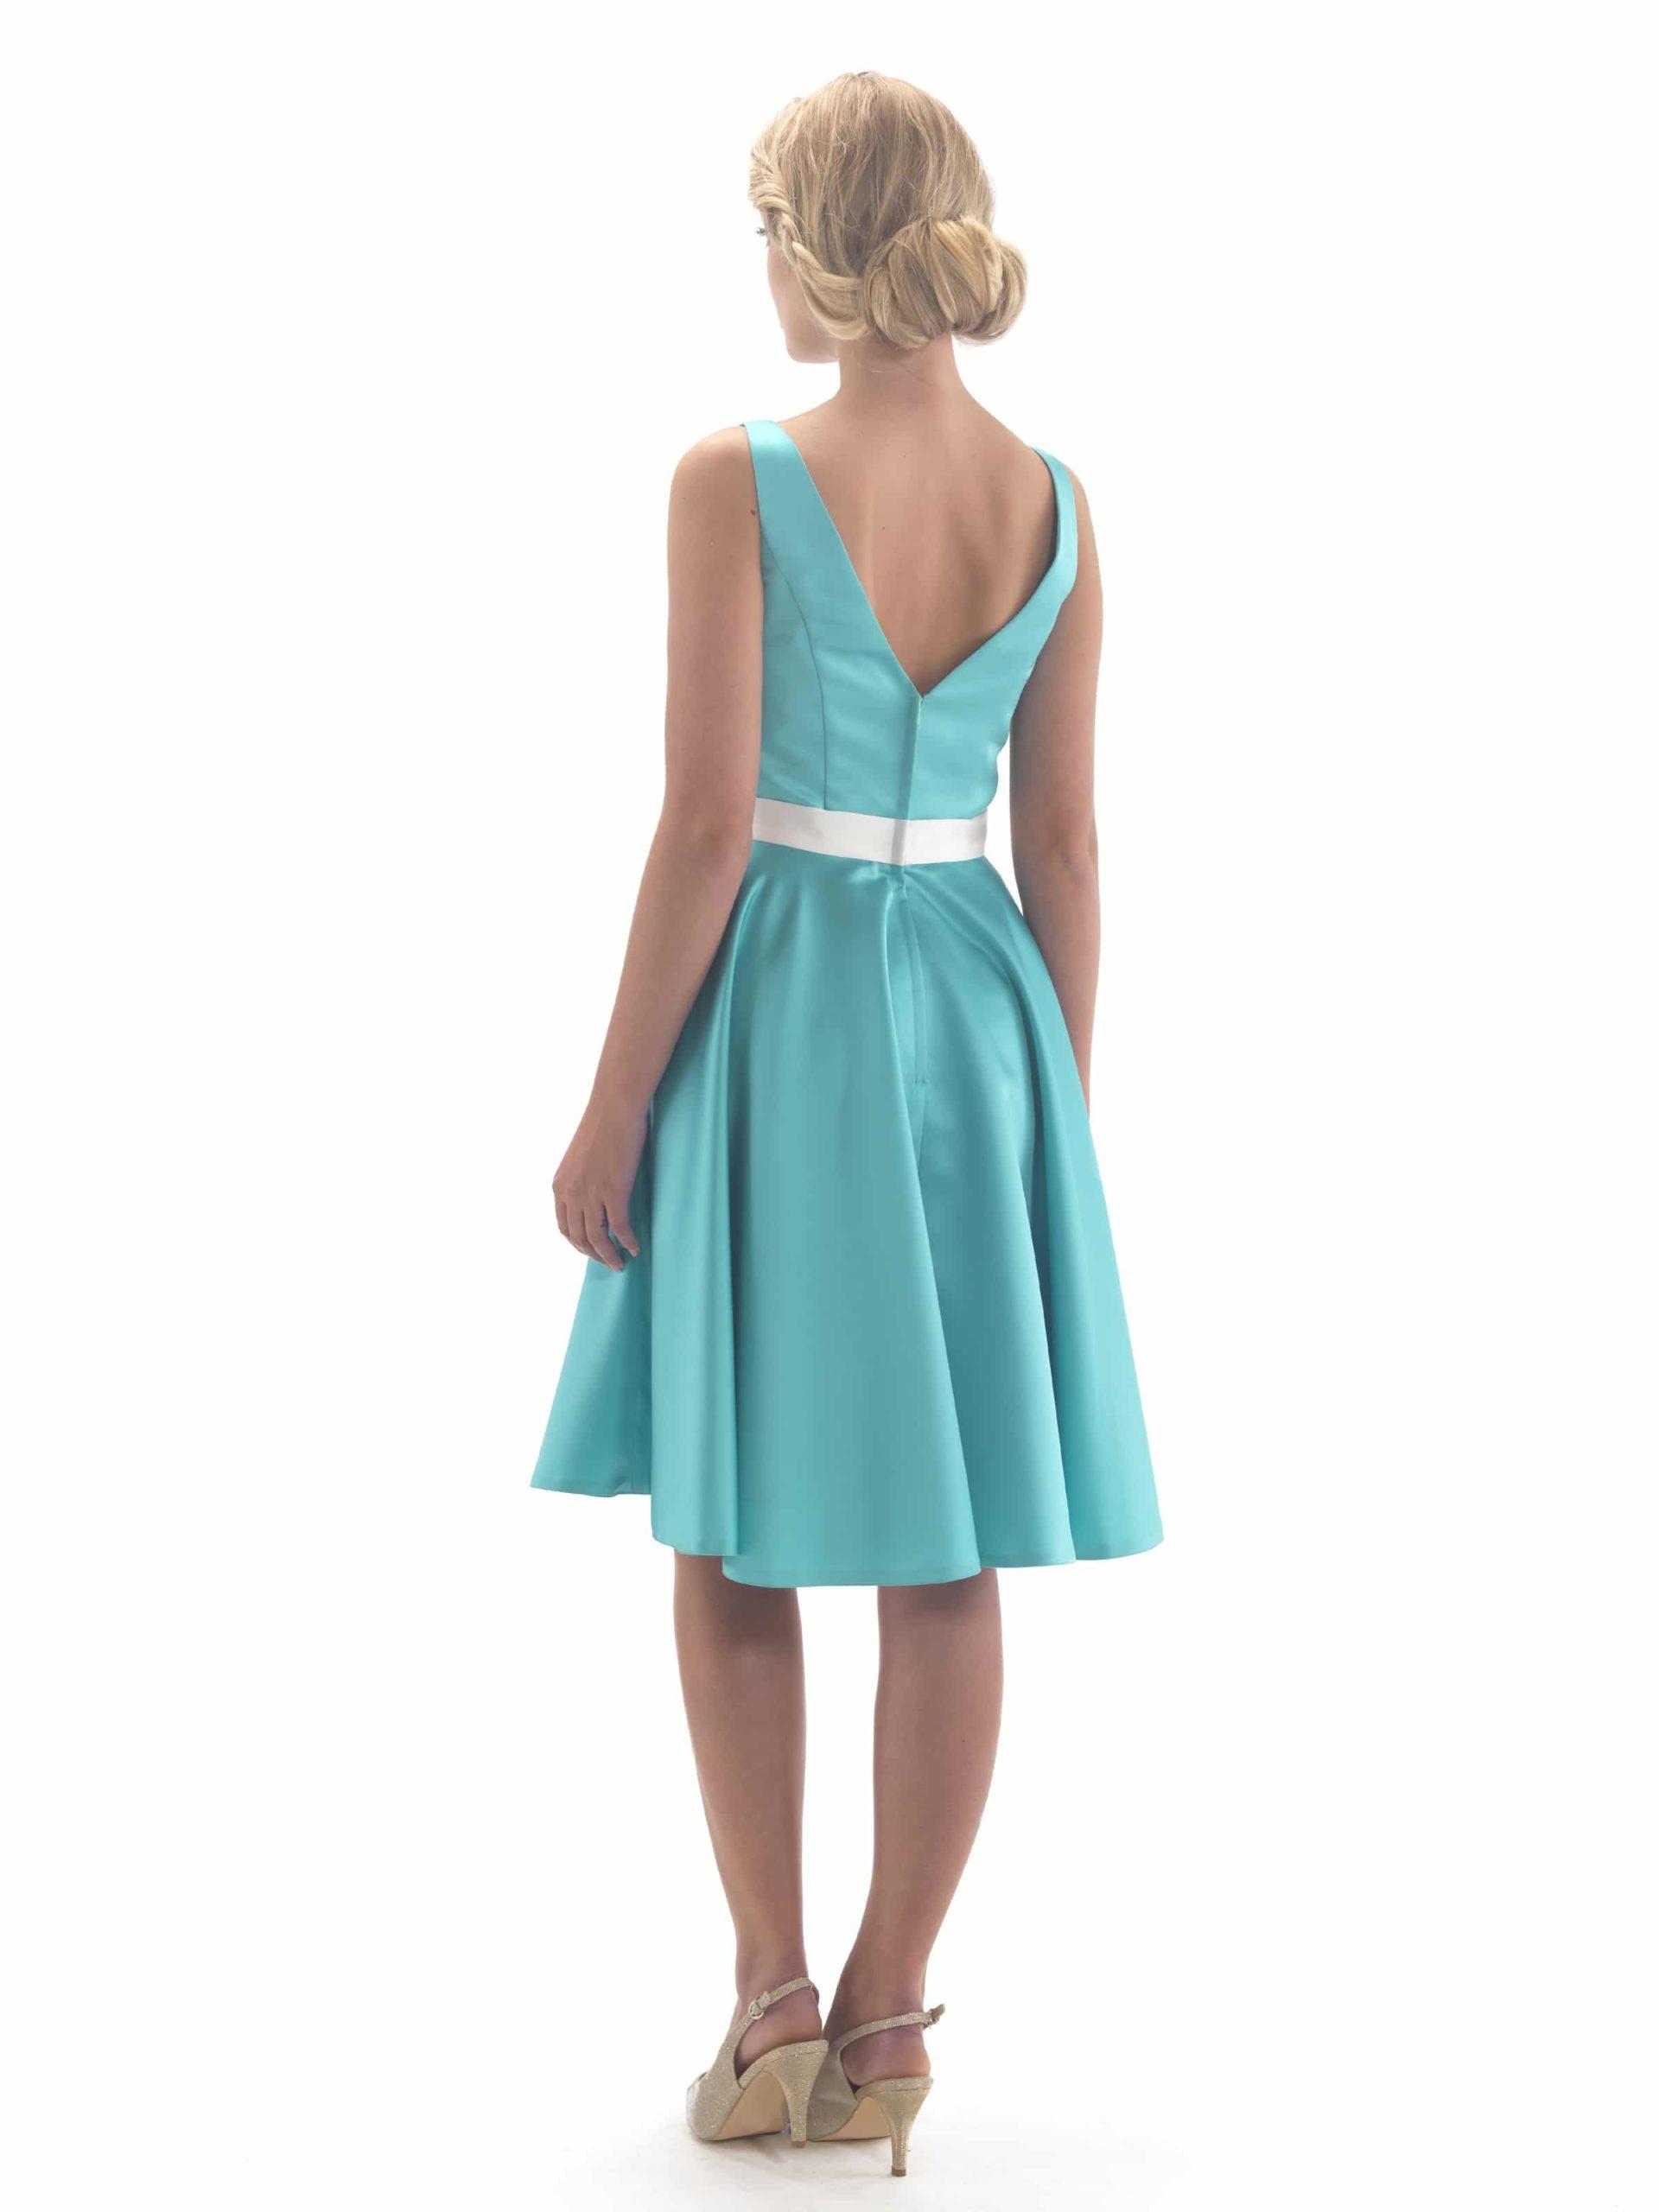 en131-tea-length-satin-bridesmaid-dress-back-72px